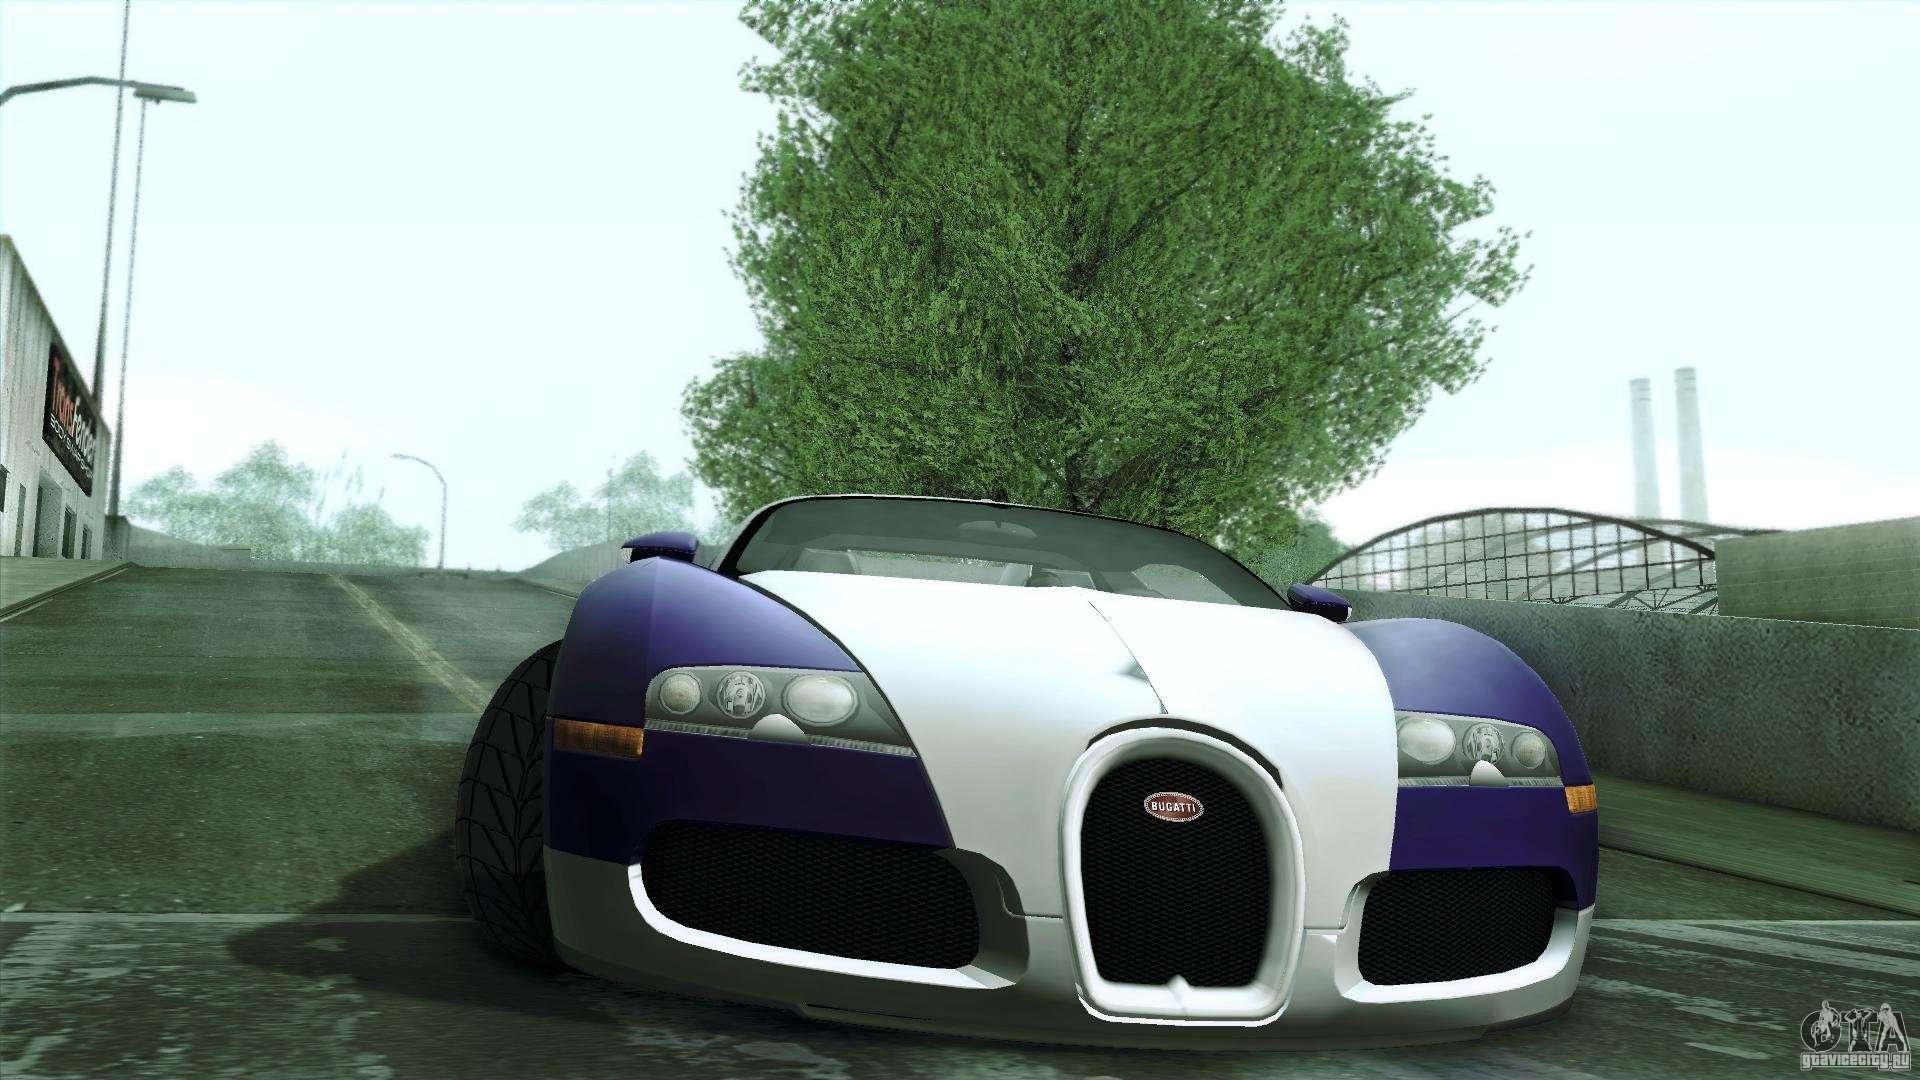 47510-1346245476-gta-sa2012-08-2916-28-54-68 Terrific Bugatti Veyron Mod Gta Sa Cars Trend